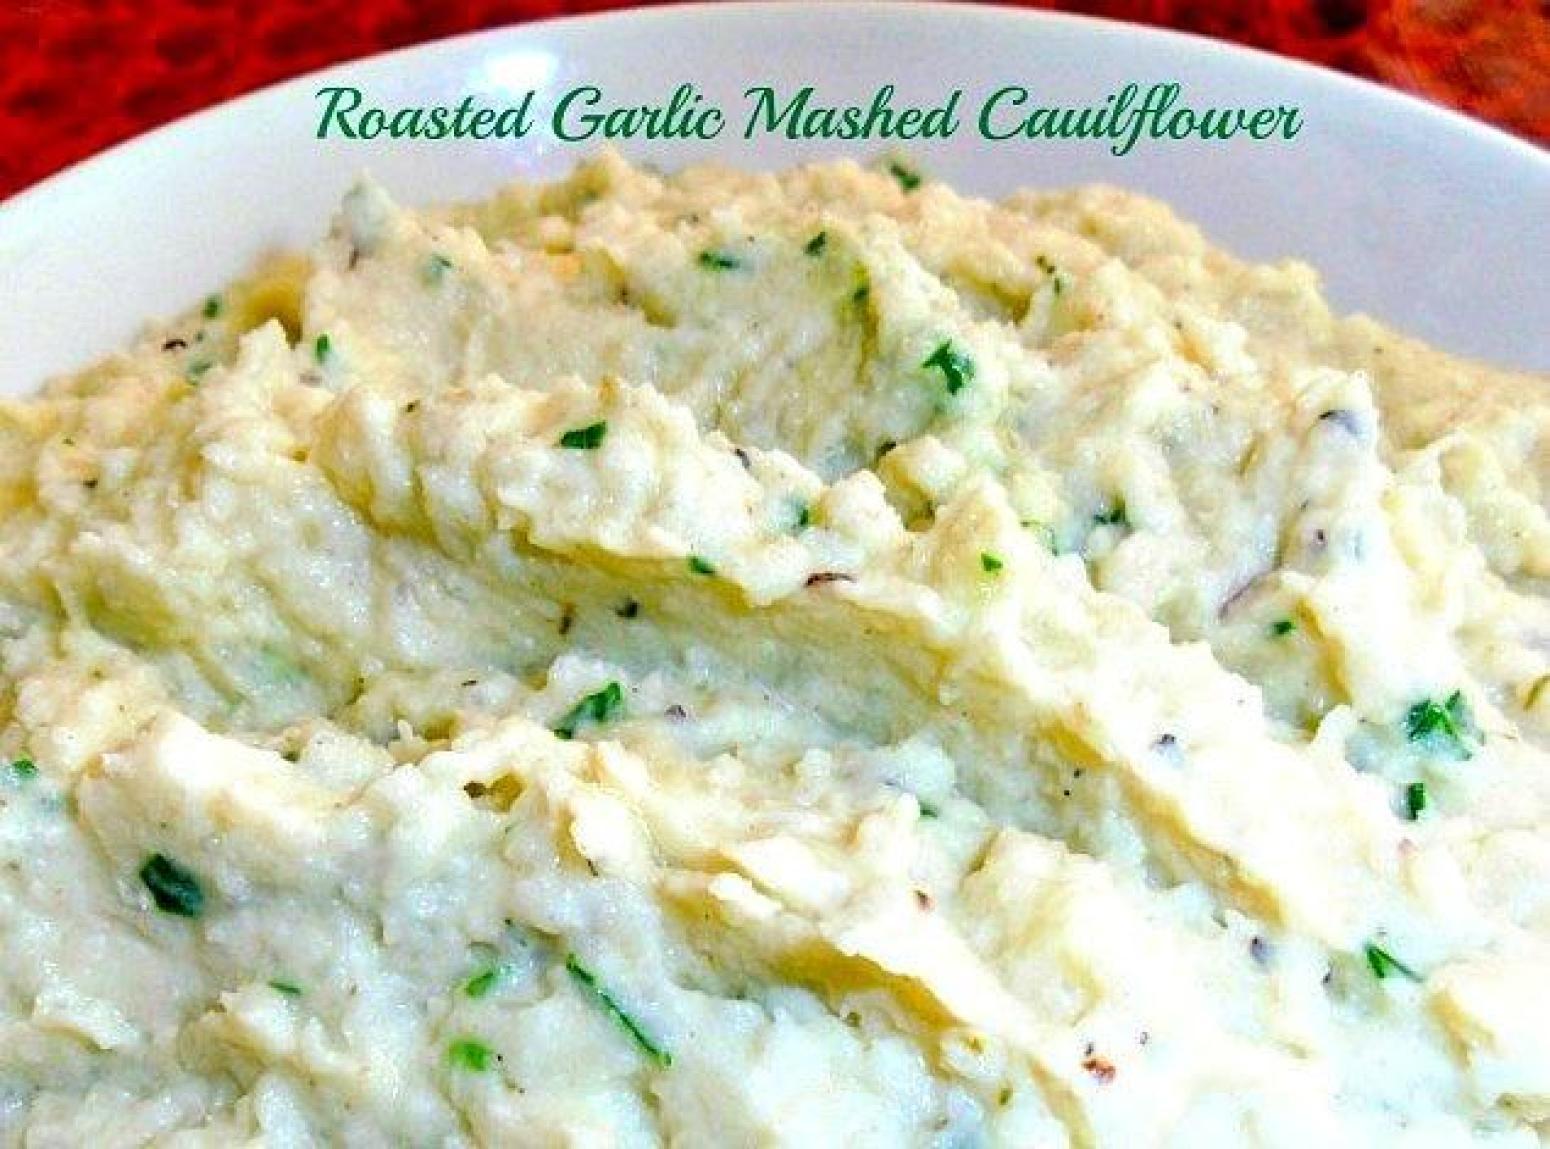 Roasted Garlic Mashed Cauliflower Recipe | Just A Pinch Recipes